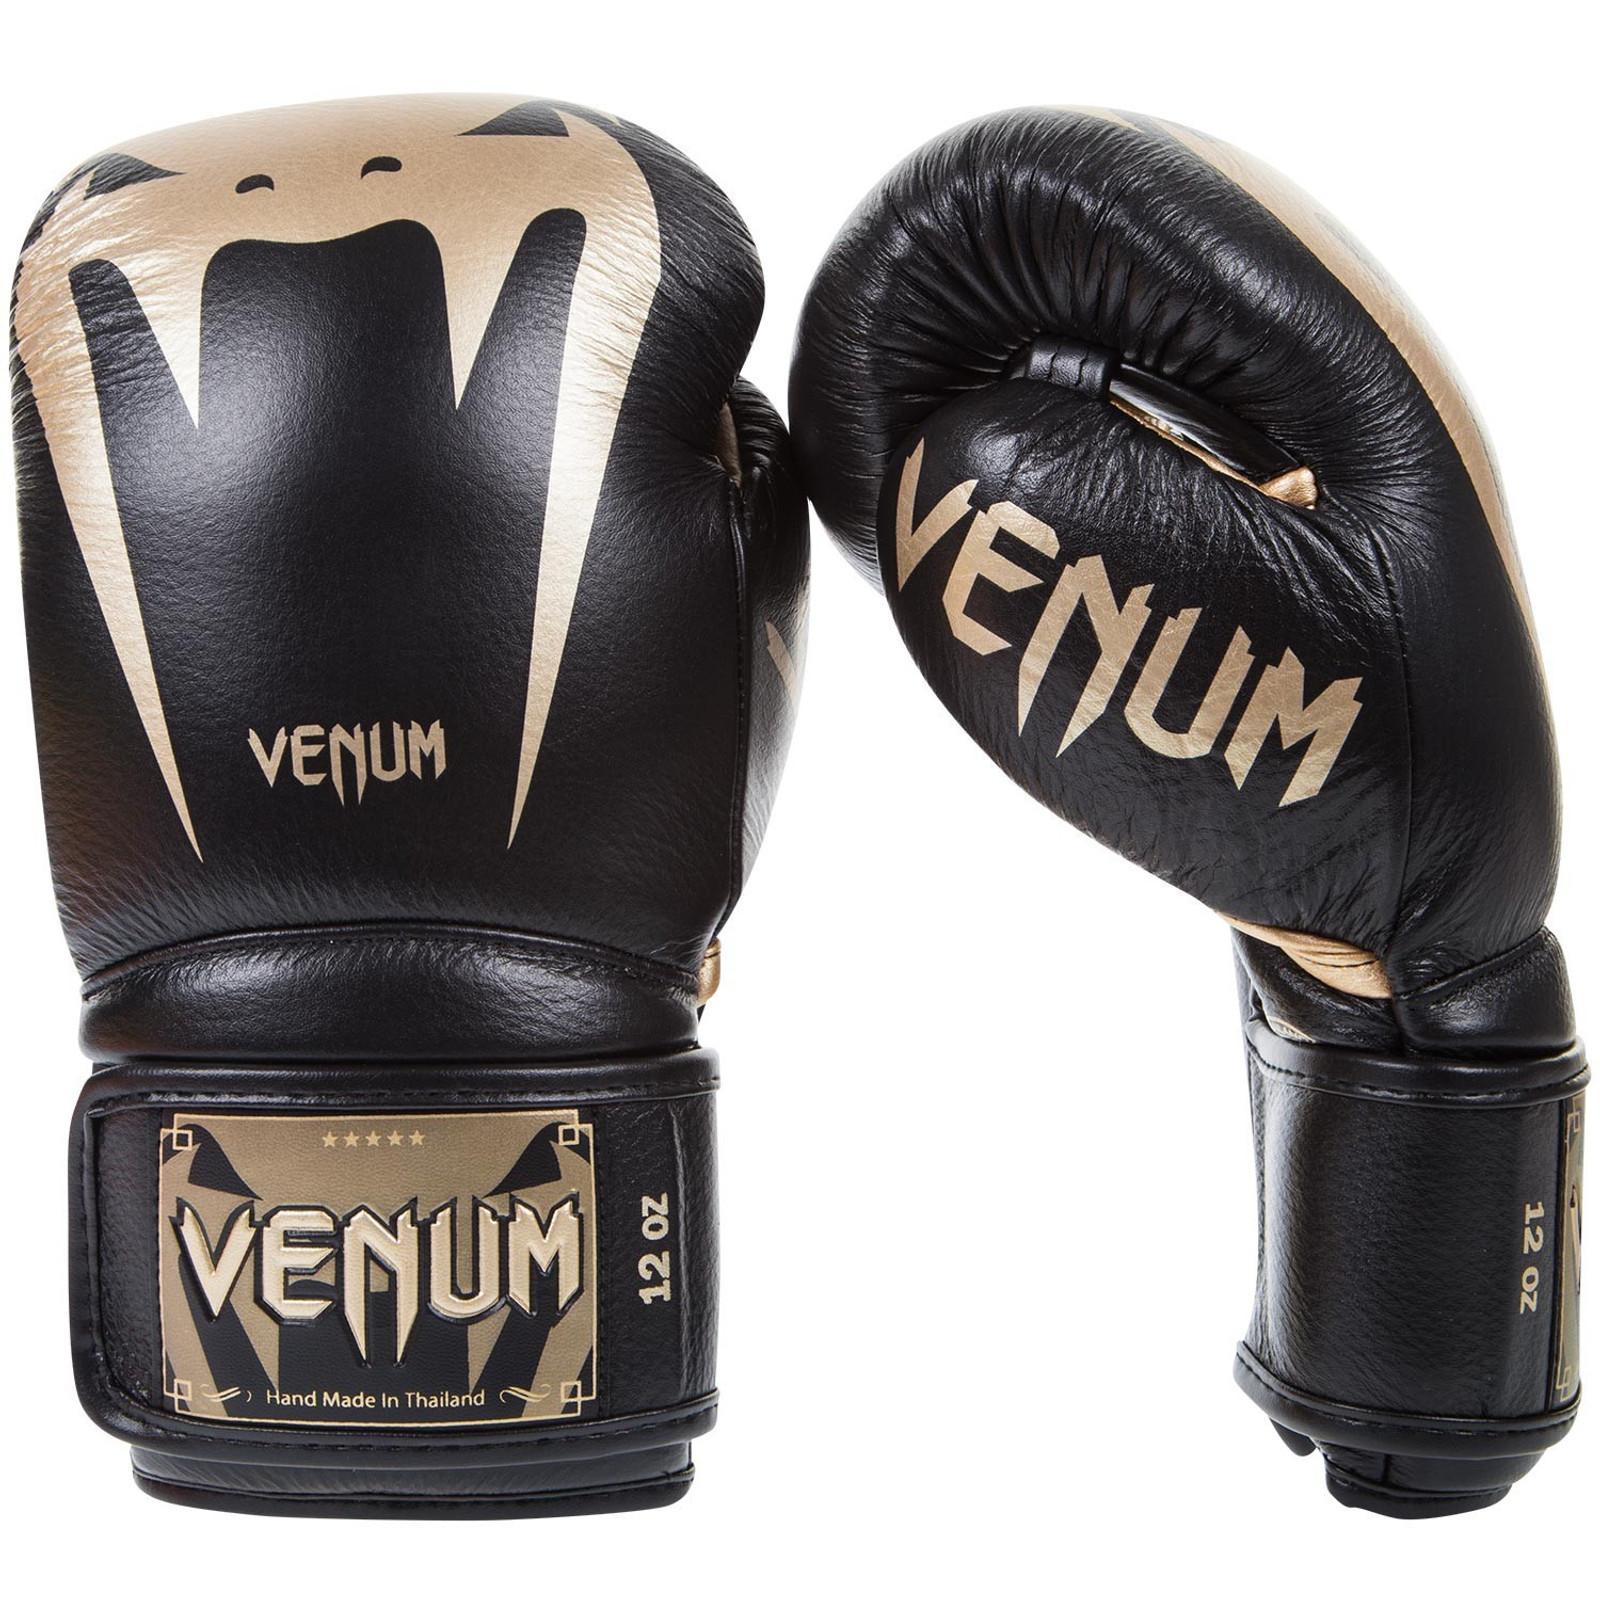 Venum Boxhandschuhe Giant 3.0